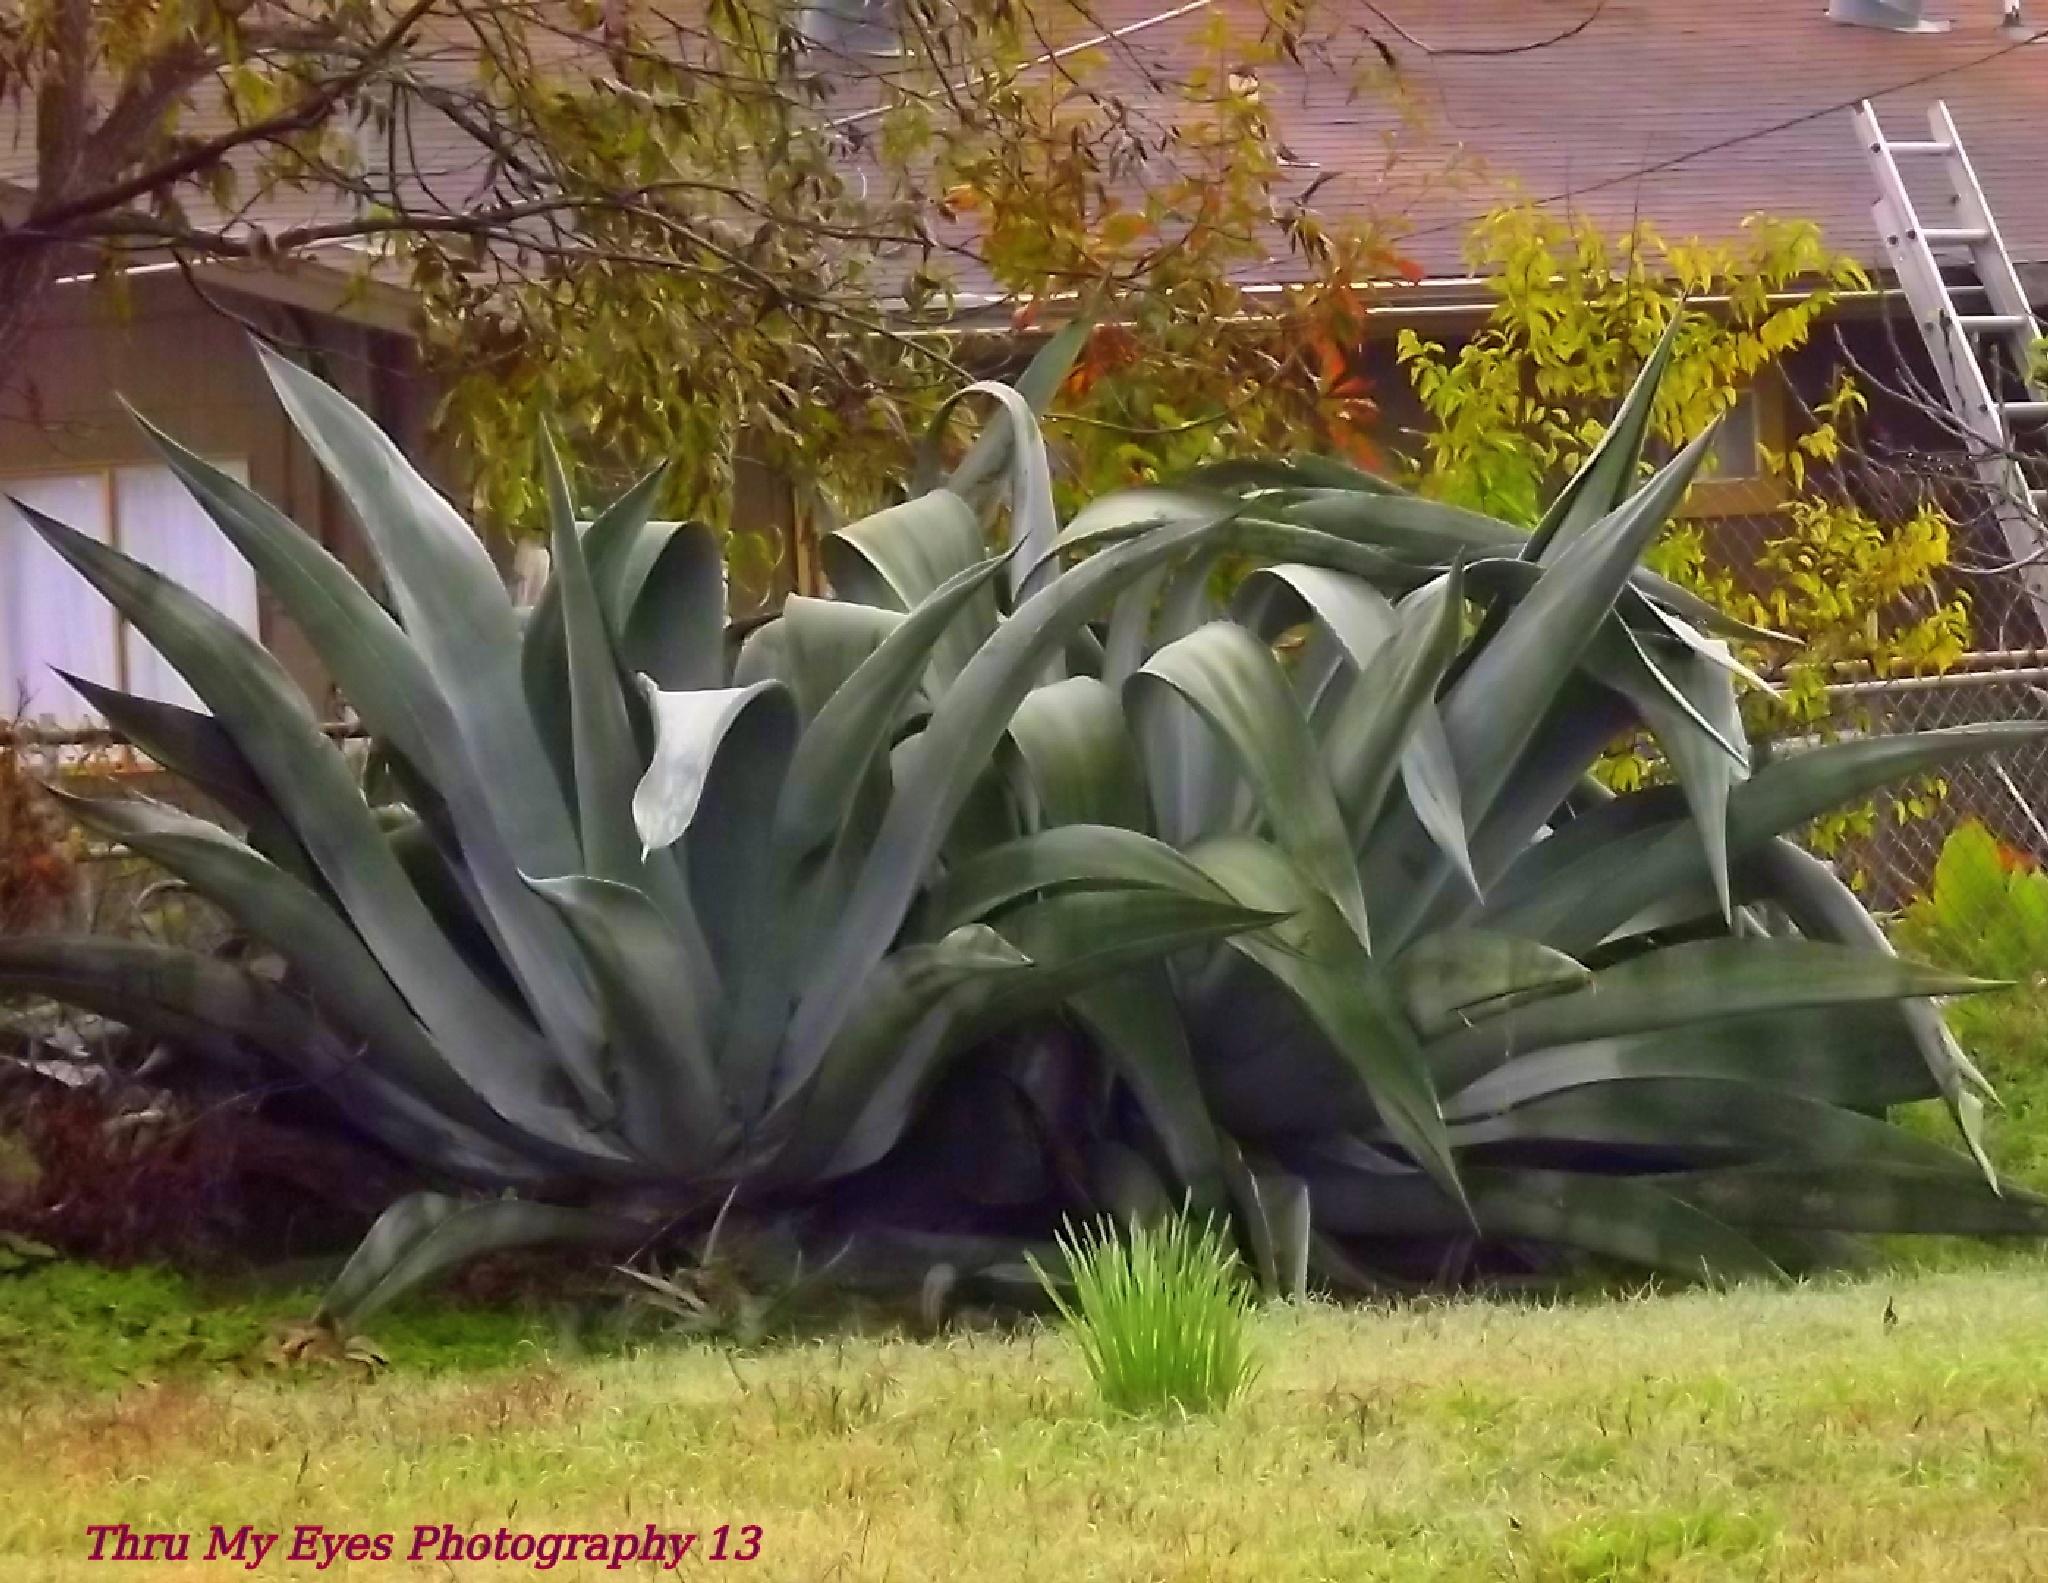 Random Huge Aloe Plant As Tall As A One Story Home by captain